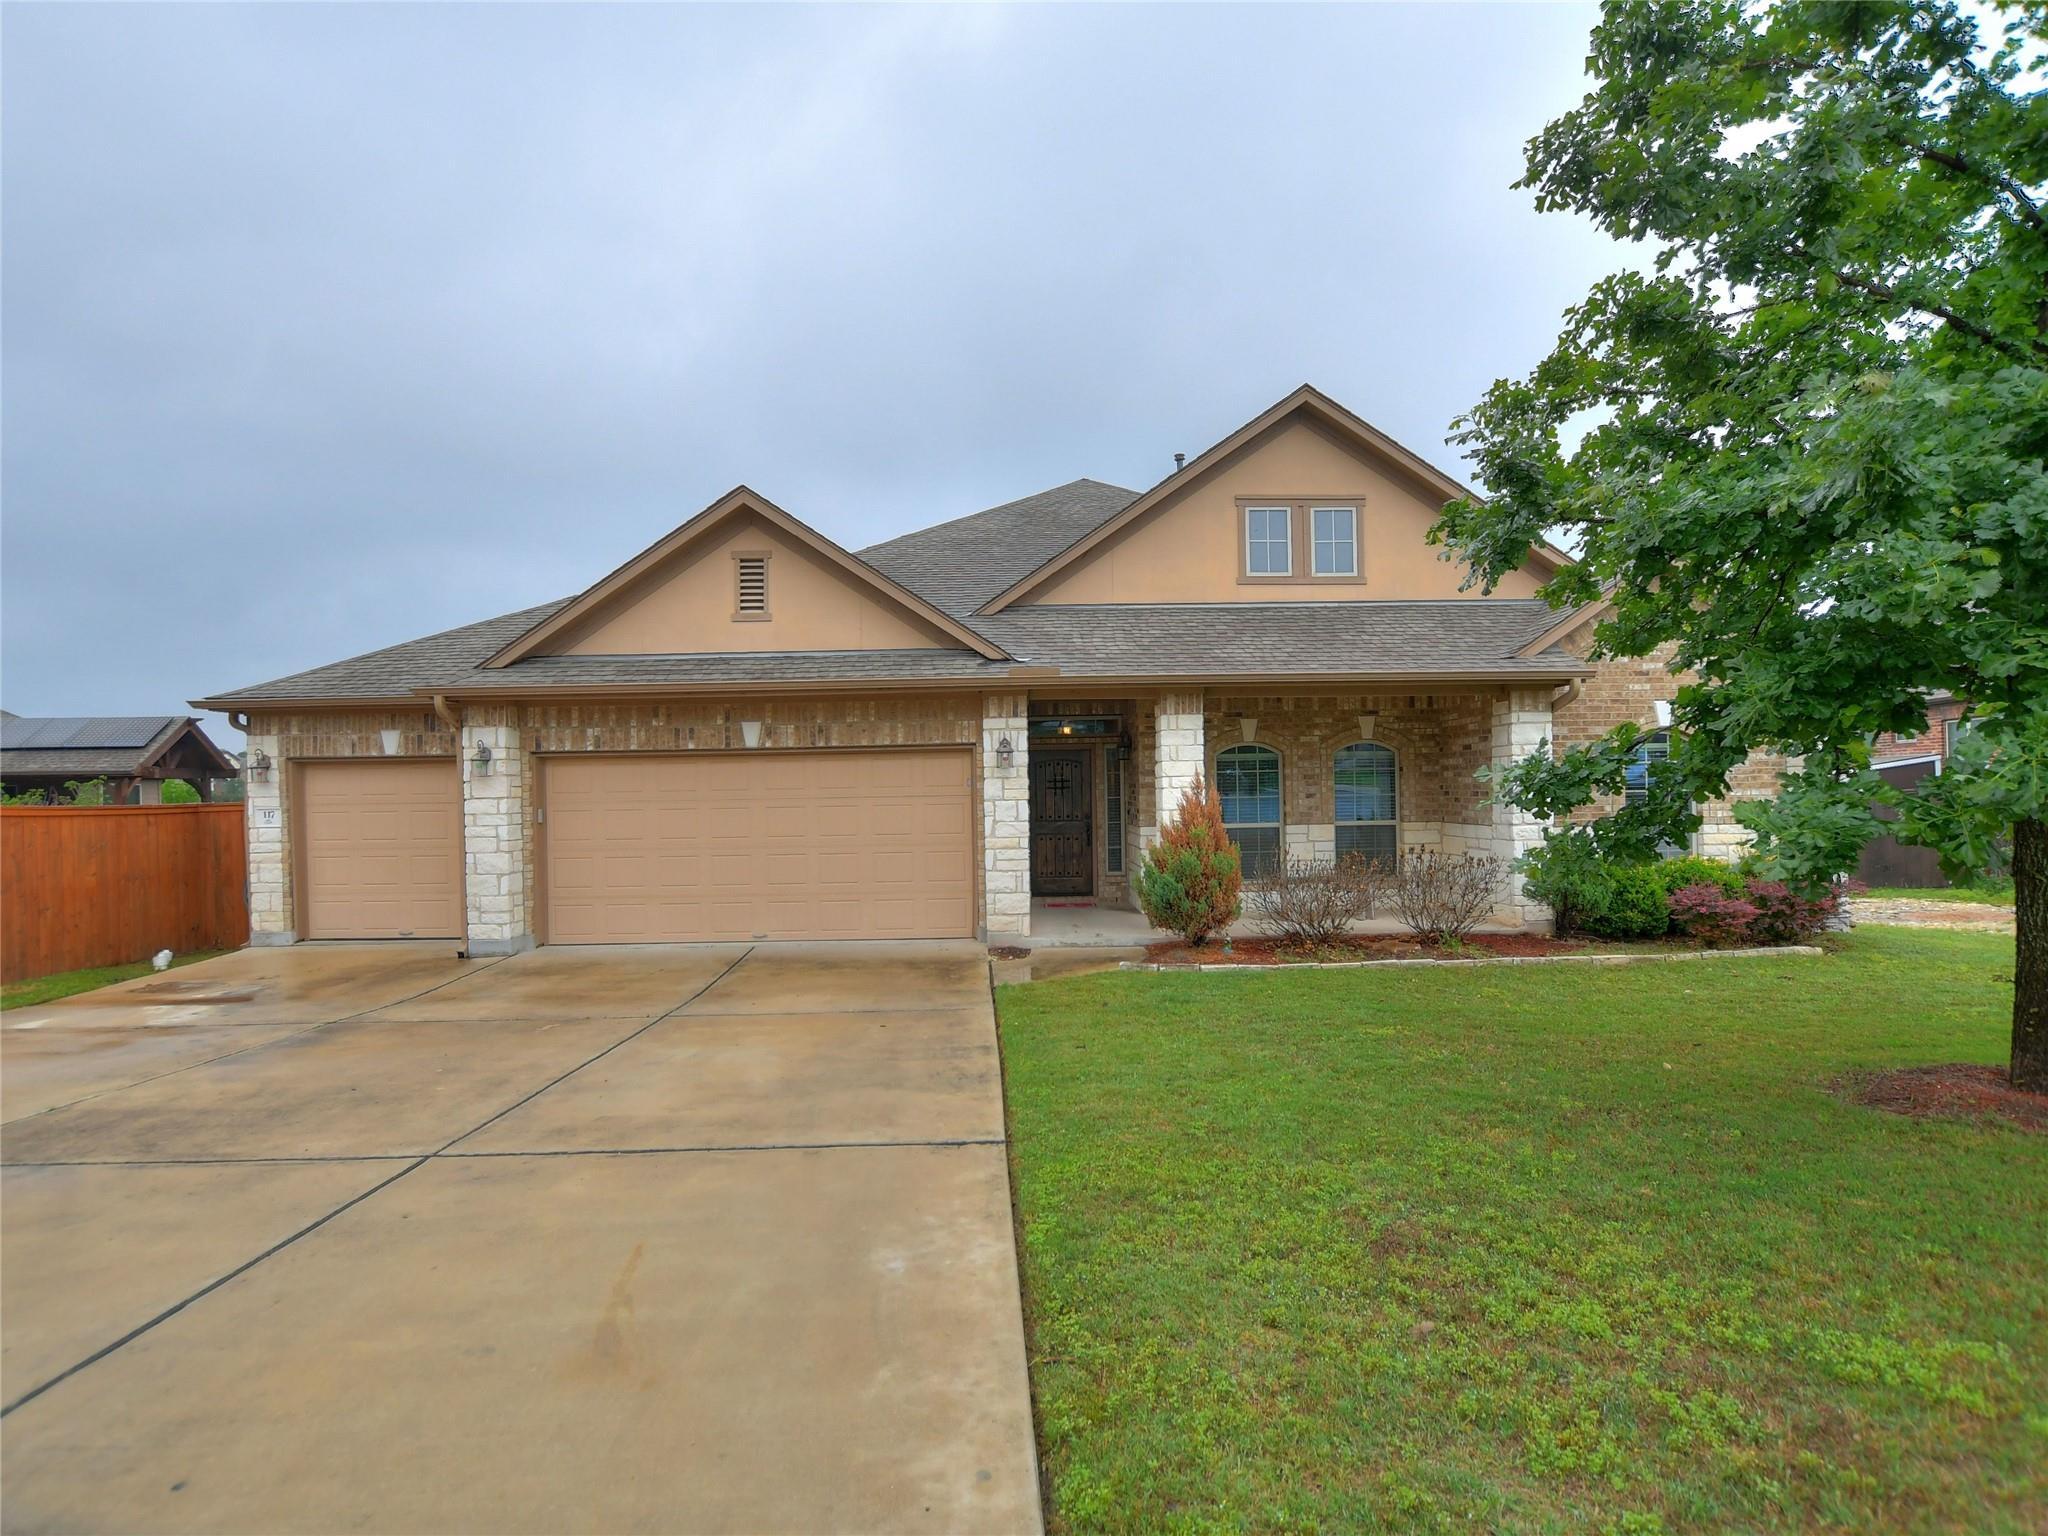 117 White Fox Cove Property Photo 1